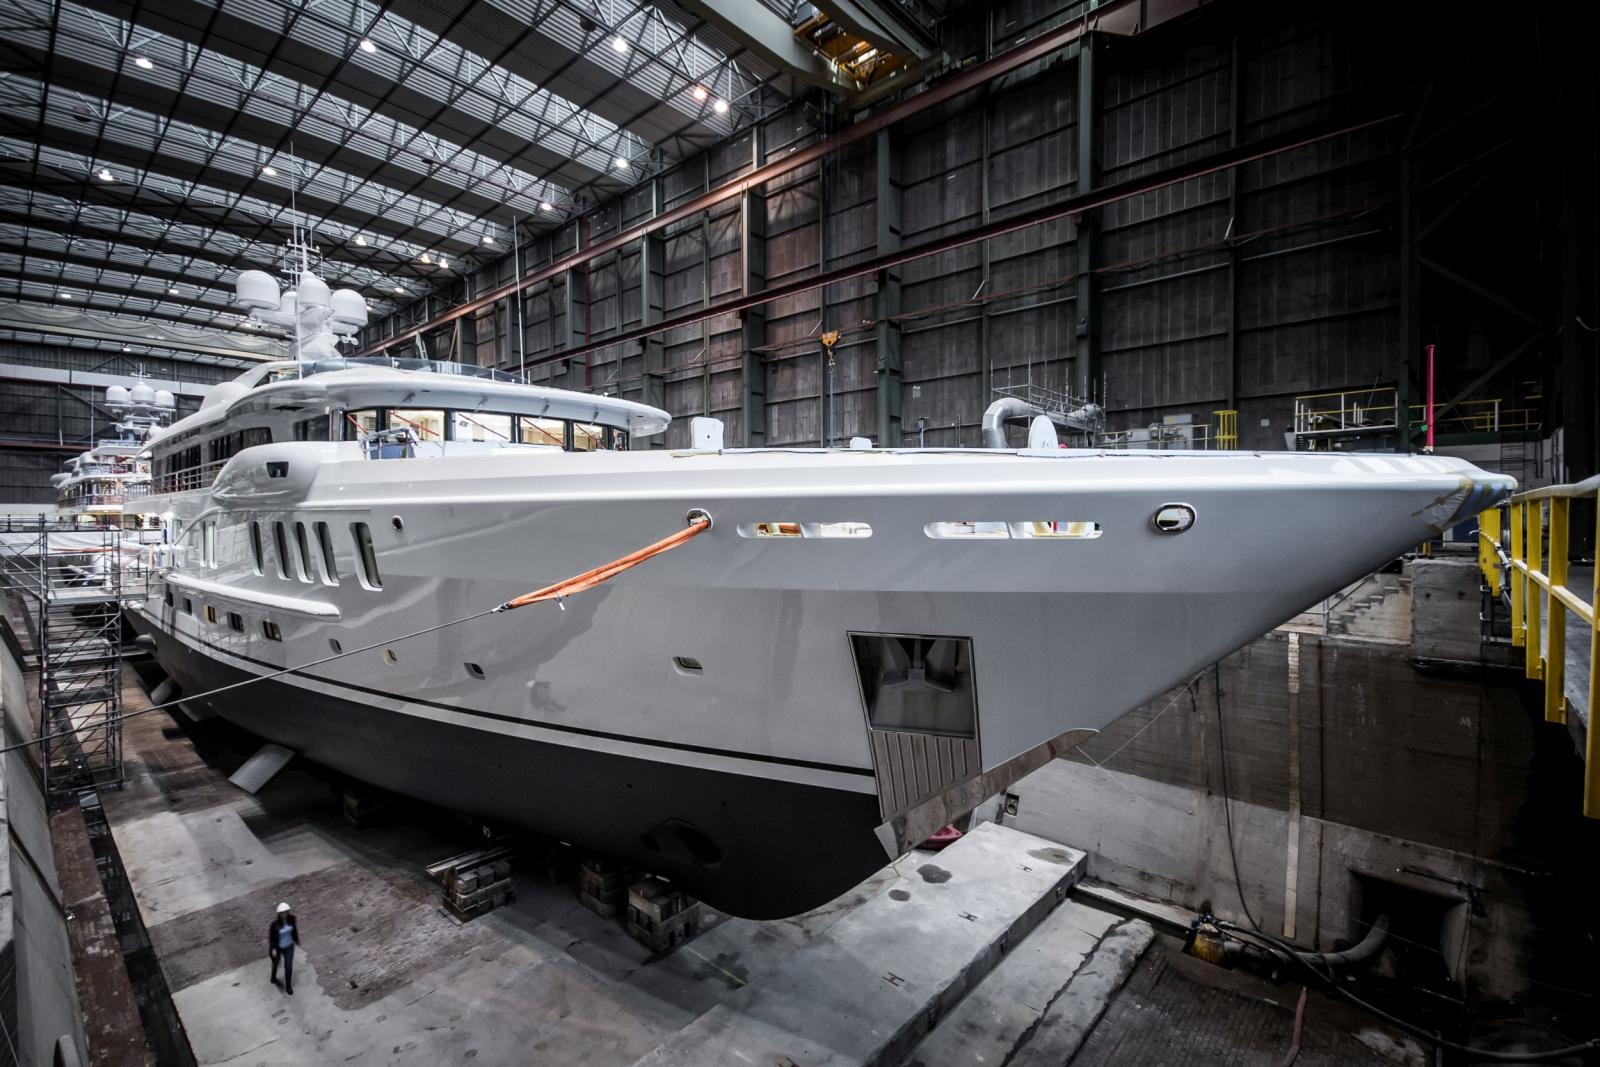 Phoenician Boat - AMELS 220 - Project WAKA